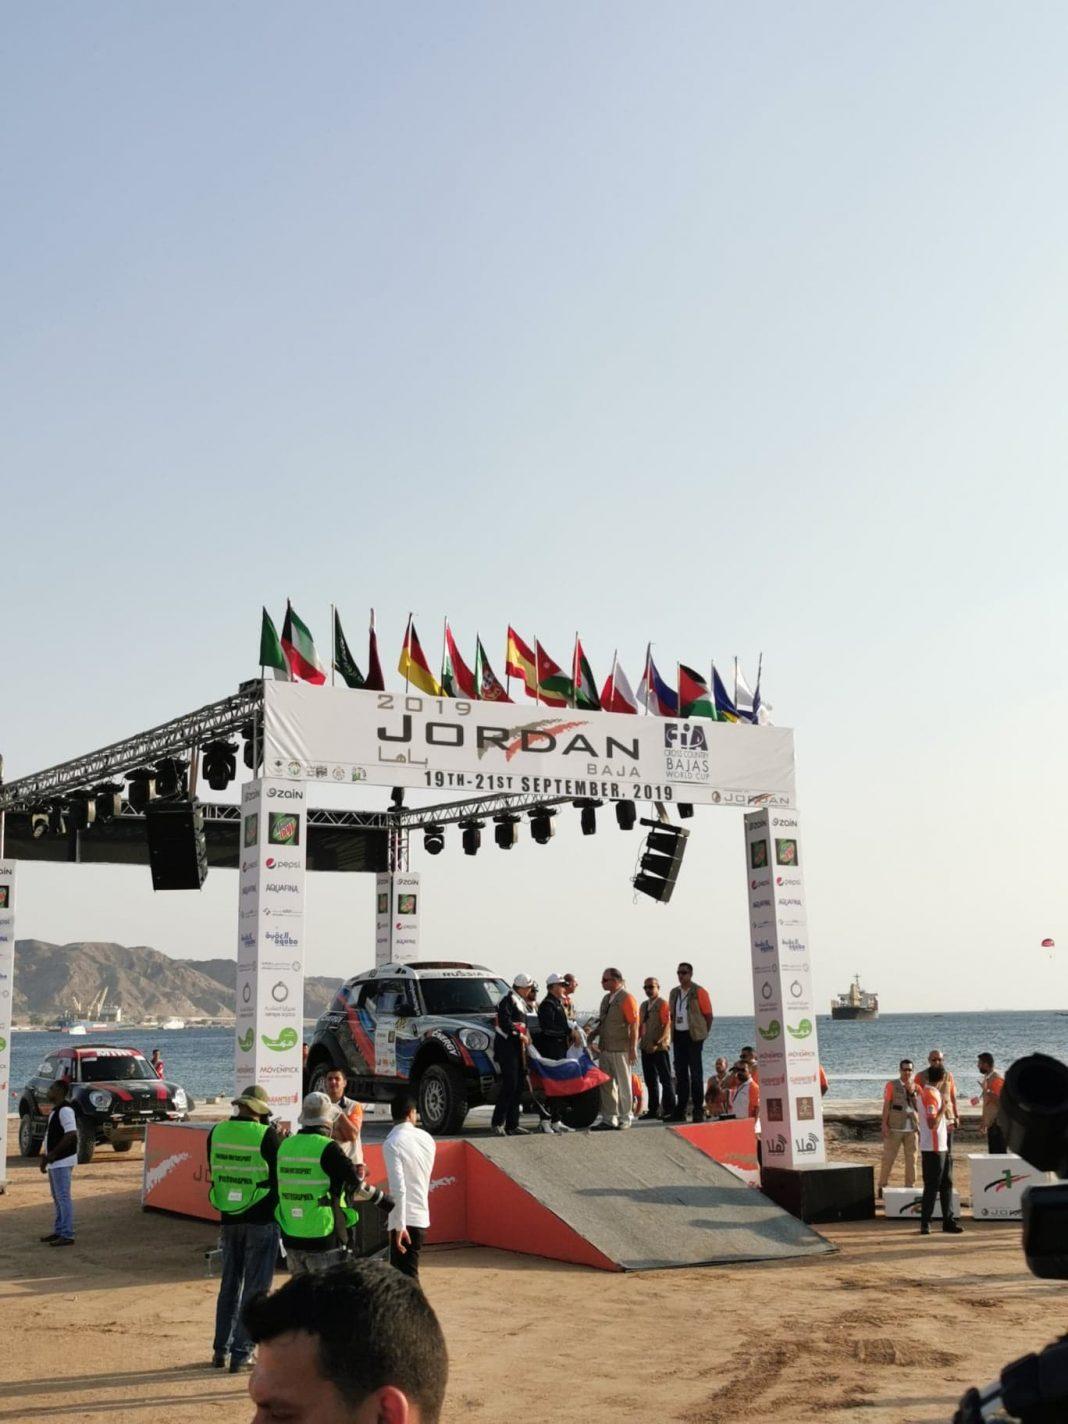 70621055_524283991734703_7604327124706525184_n-1068x1424 Jakub Przygonski castiga prima editie Jordan Baja